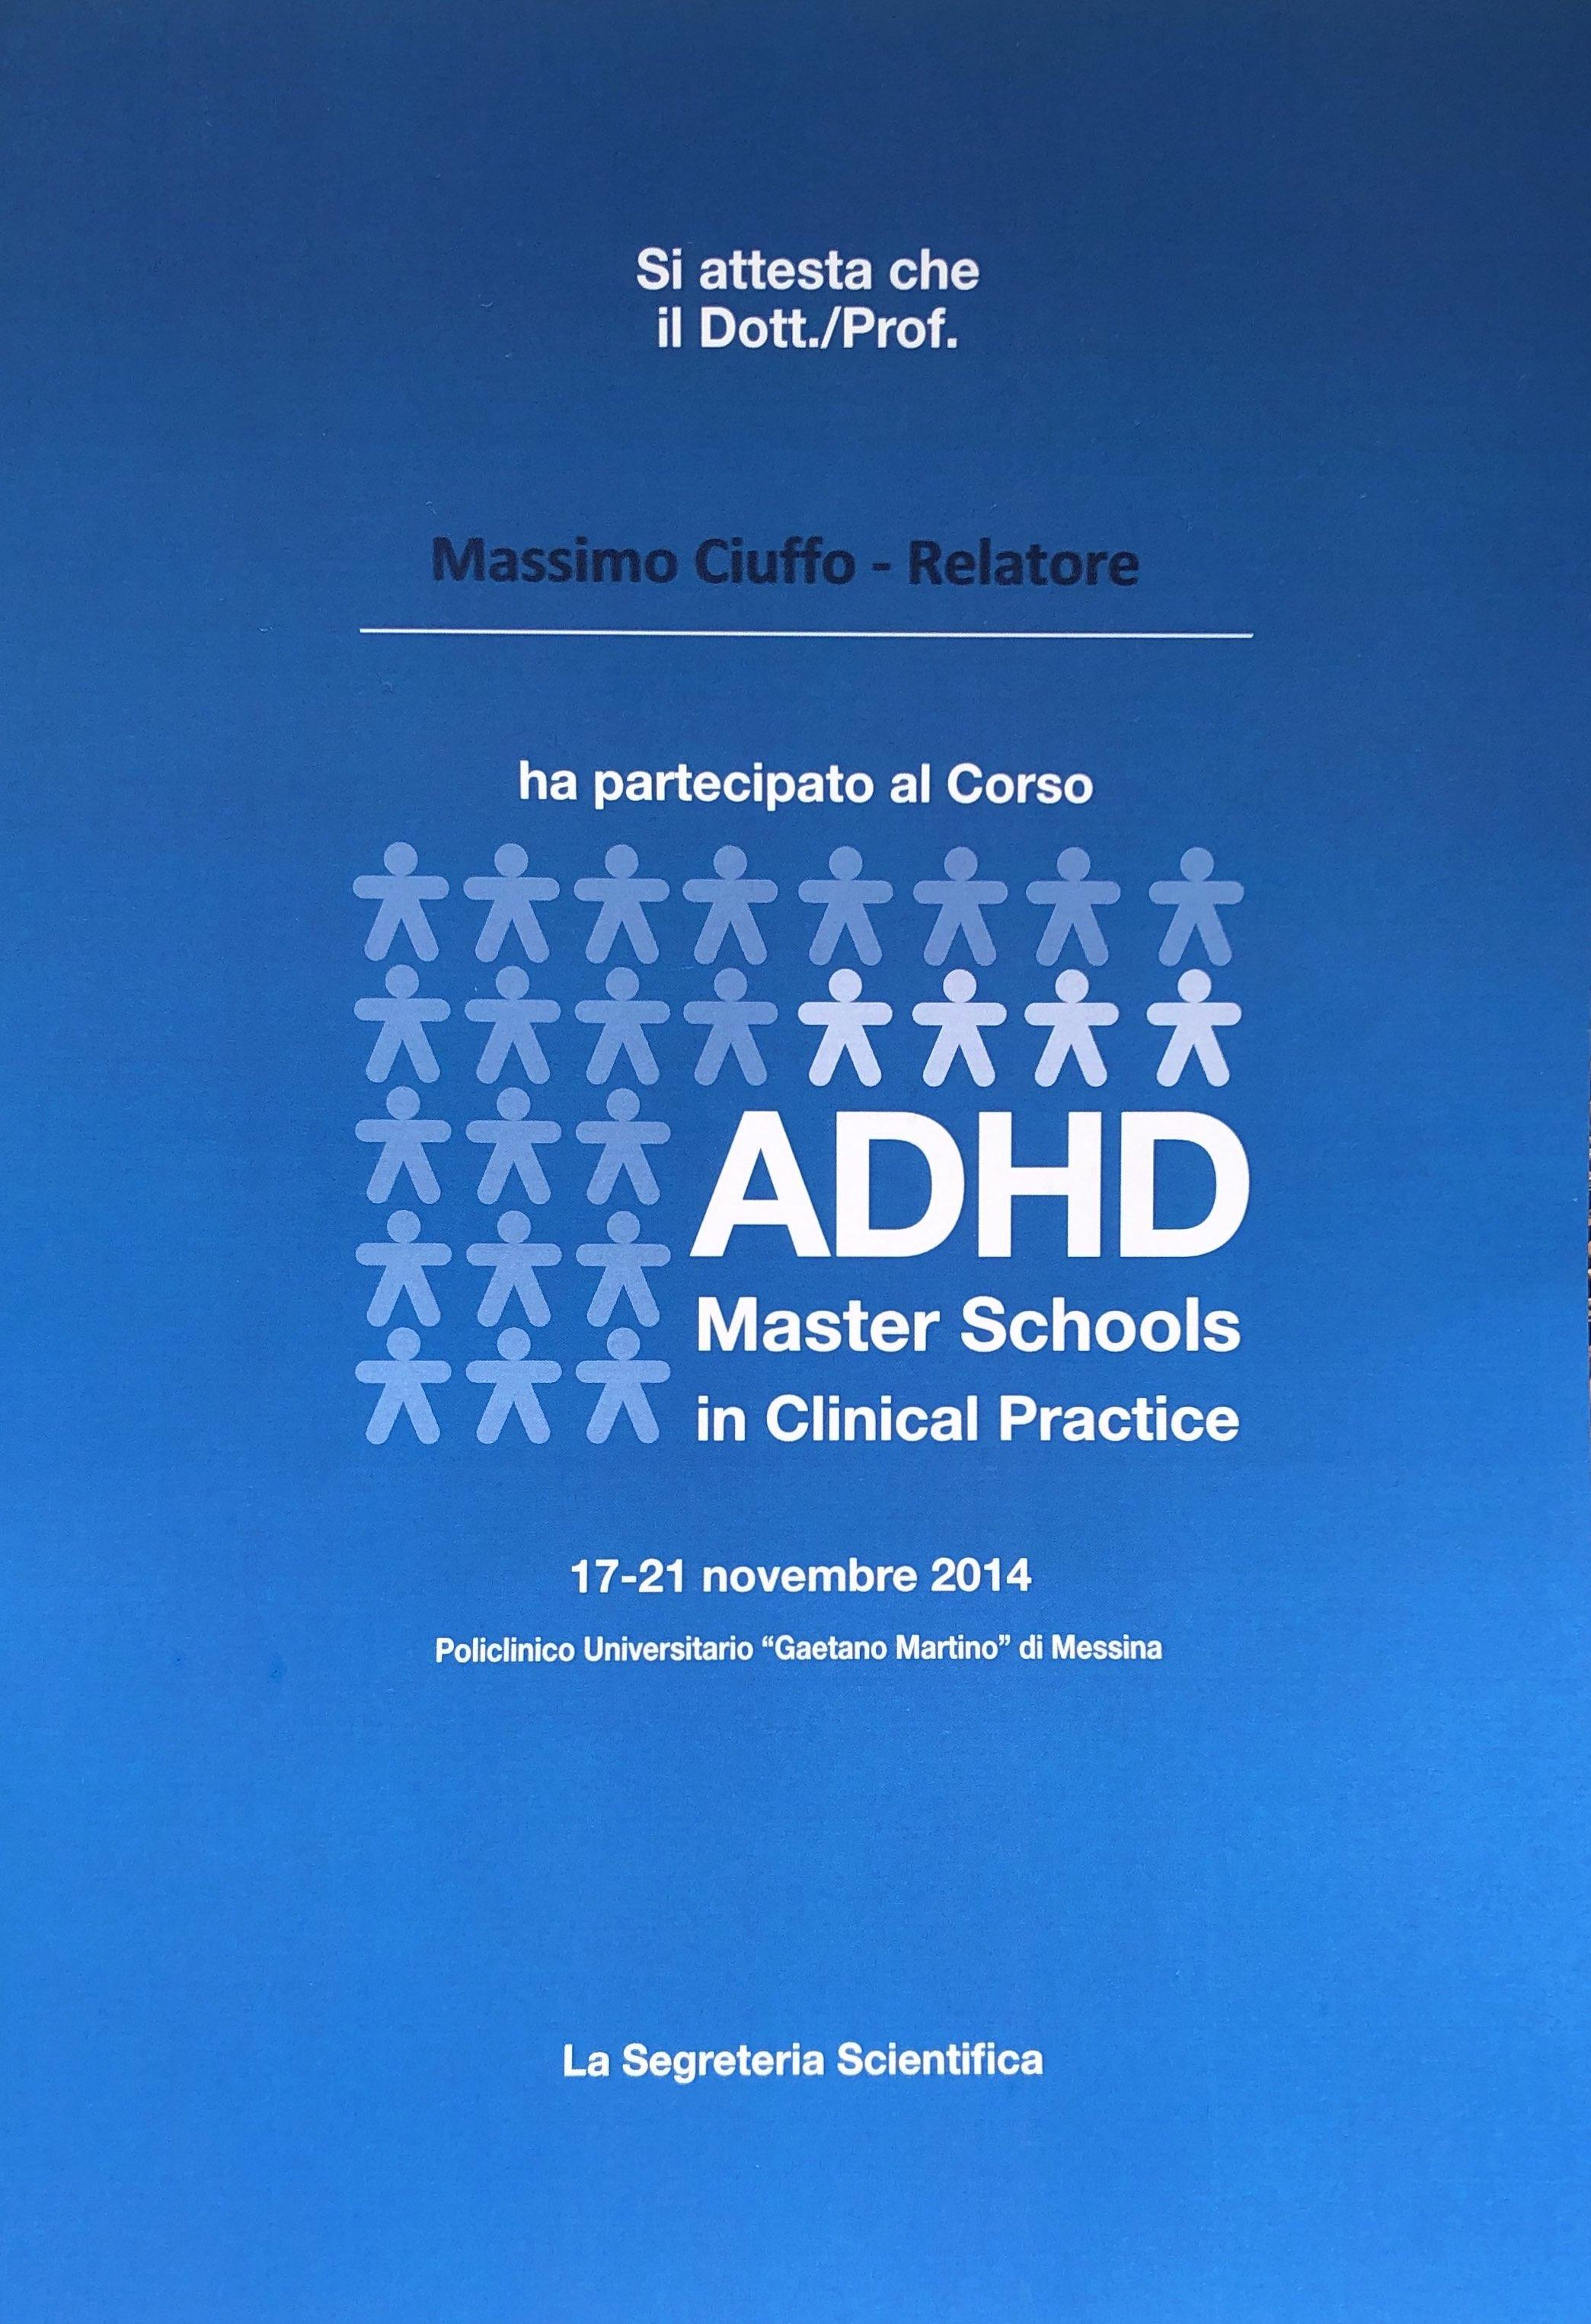 Corso ADHD